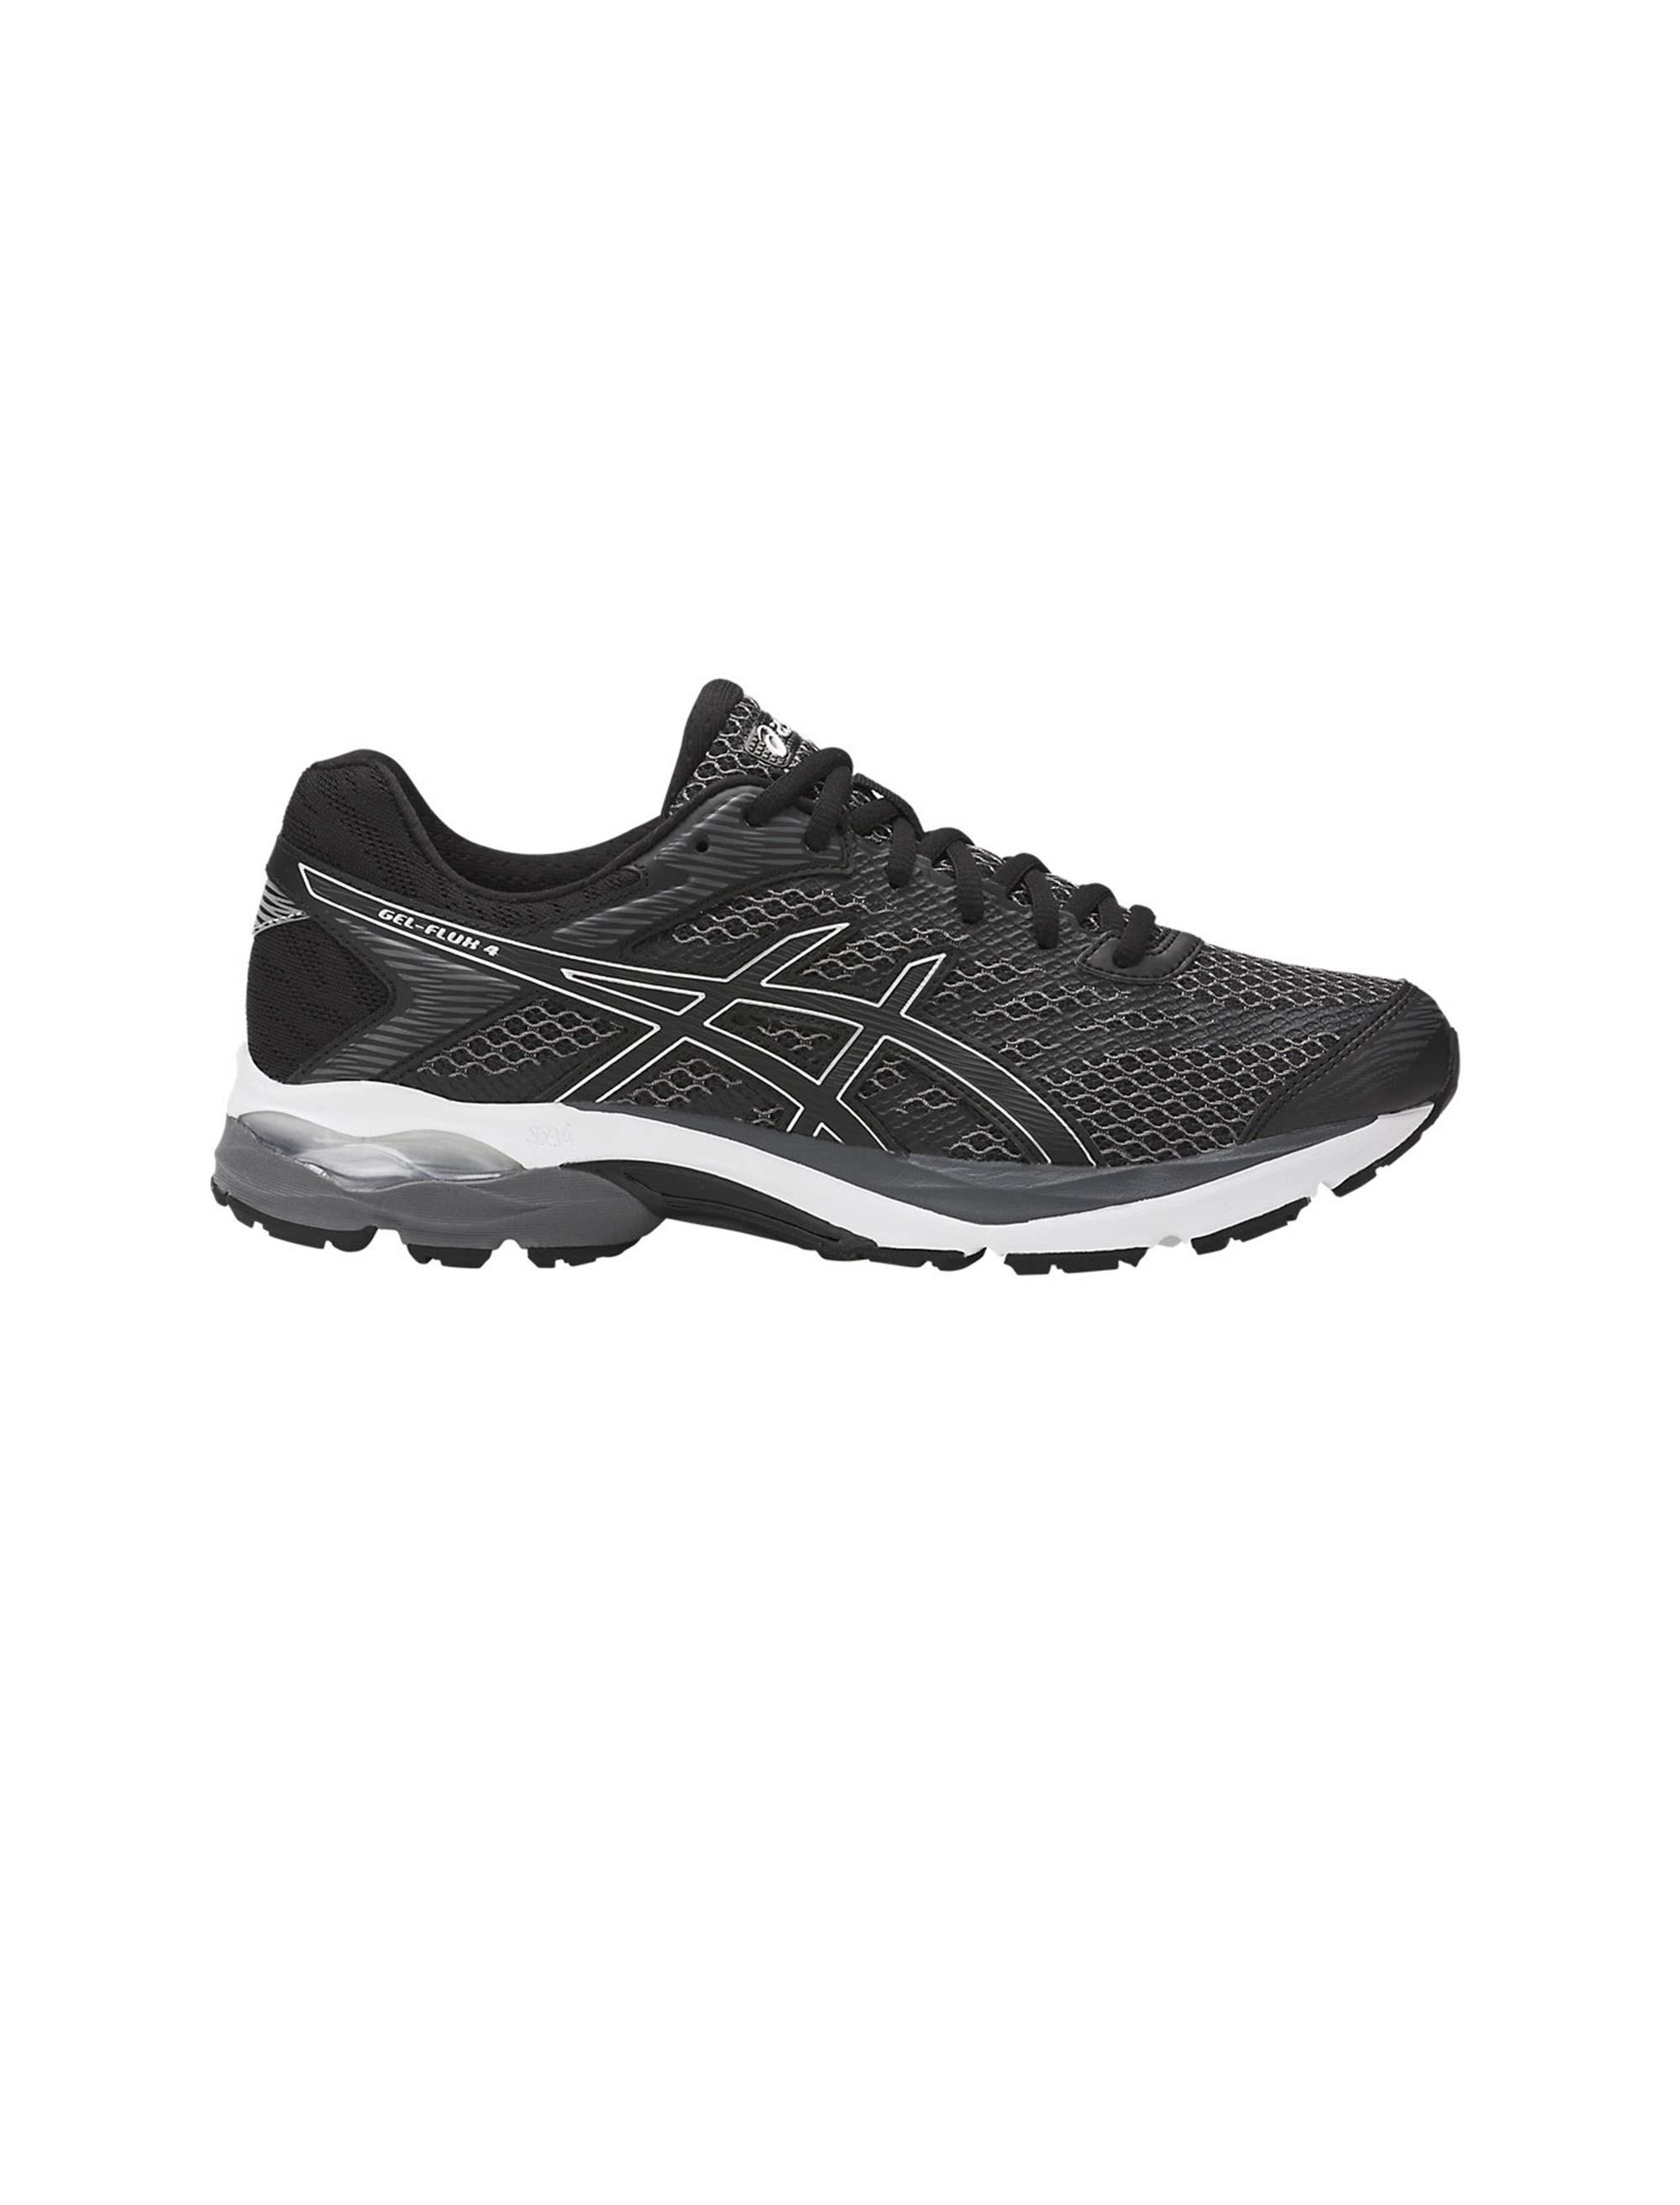 کفش دویدن بندی مردانه GEL-FLUX 4 - اسیکس - مشکي - 1